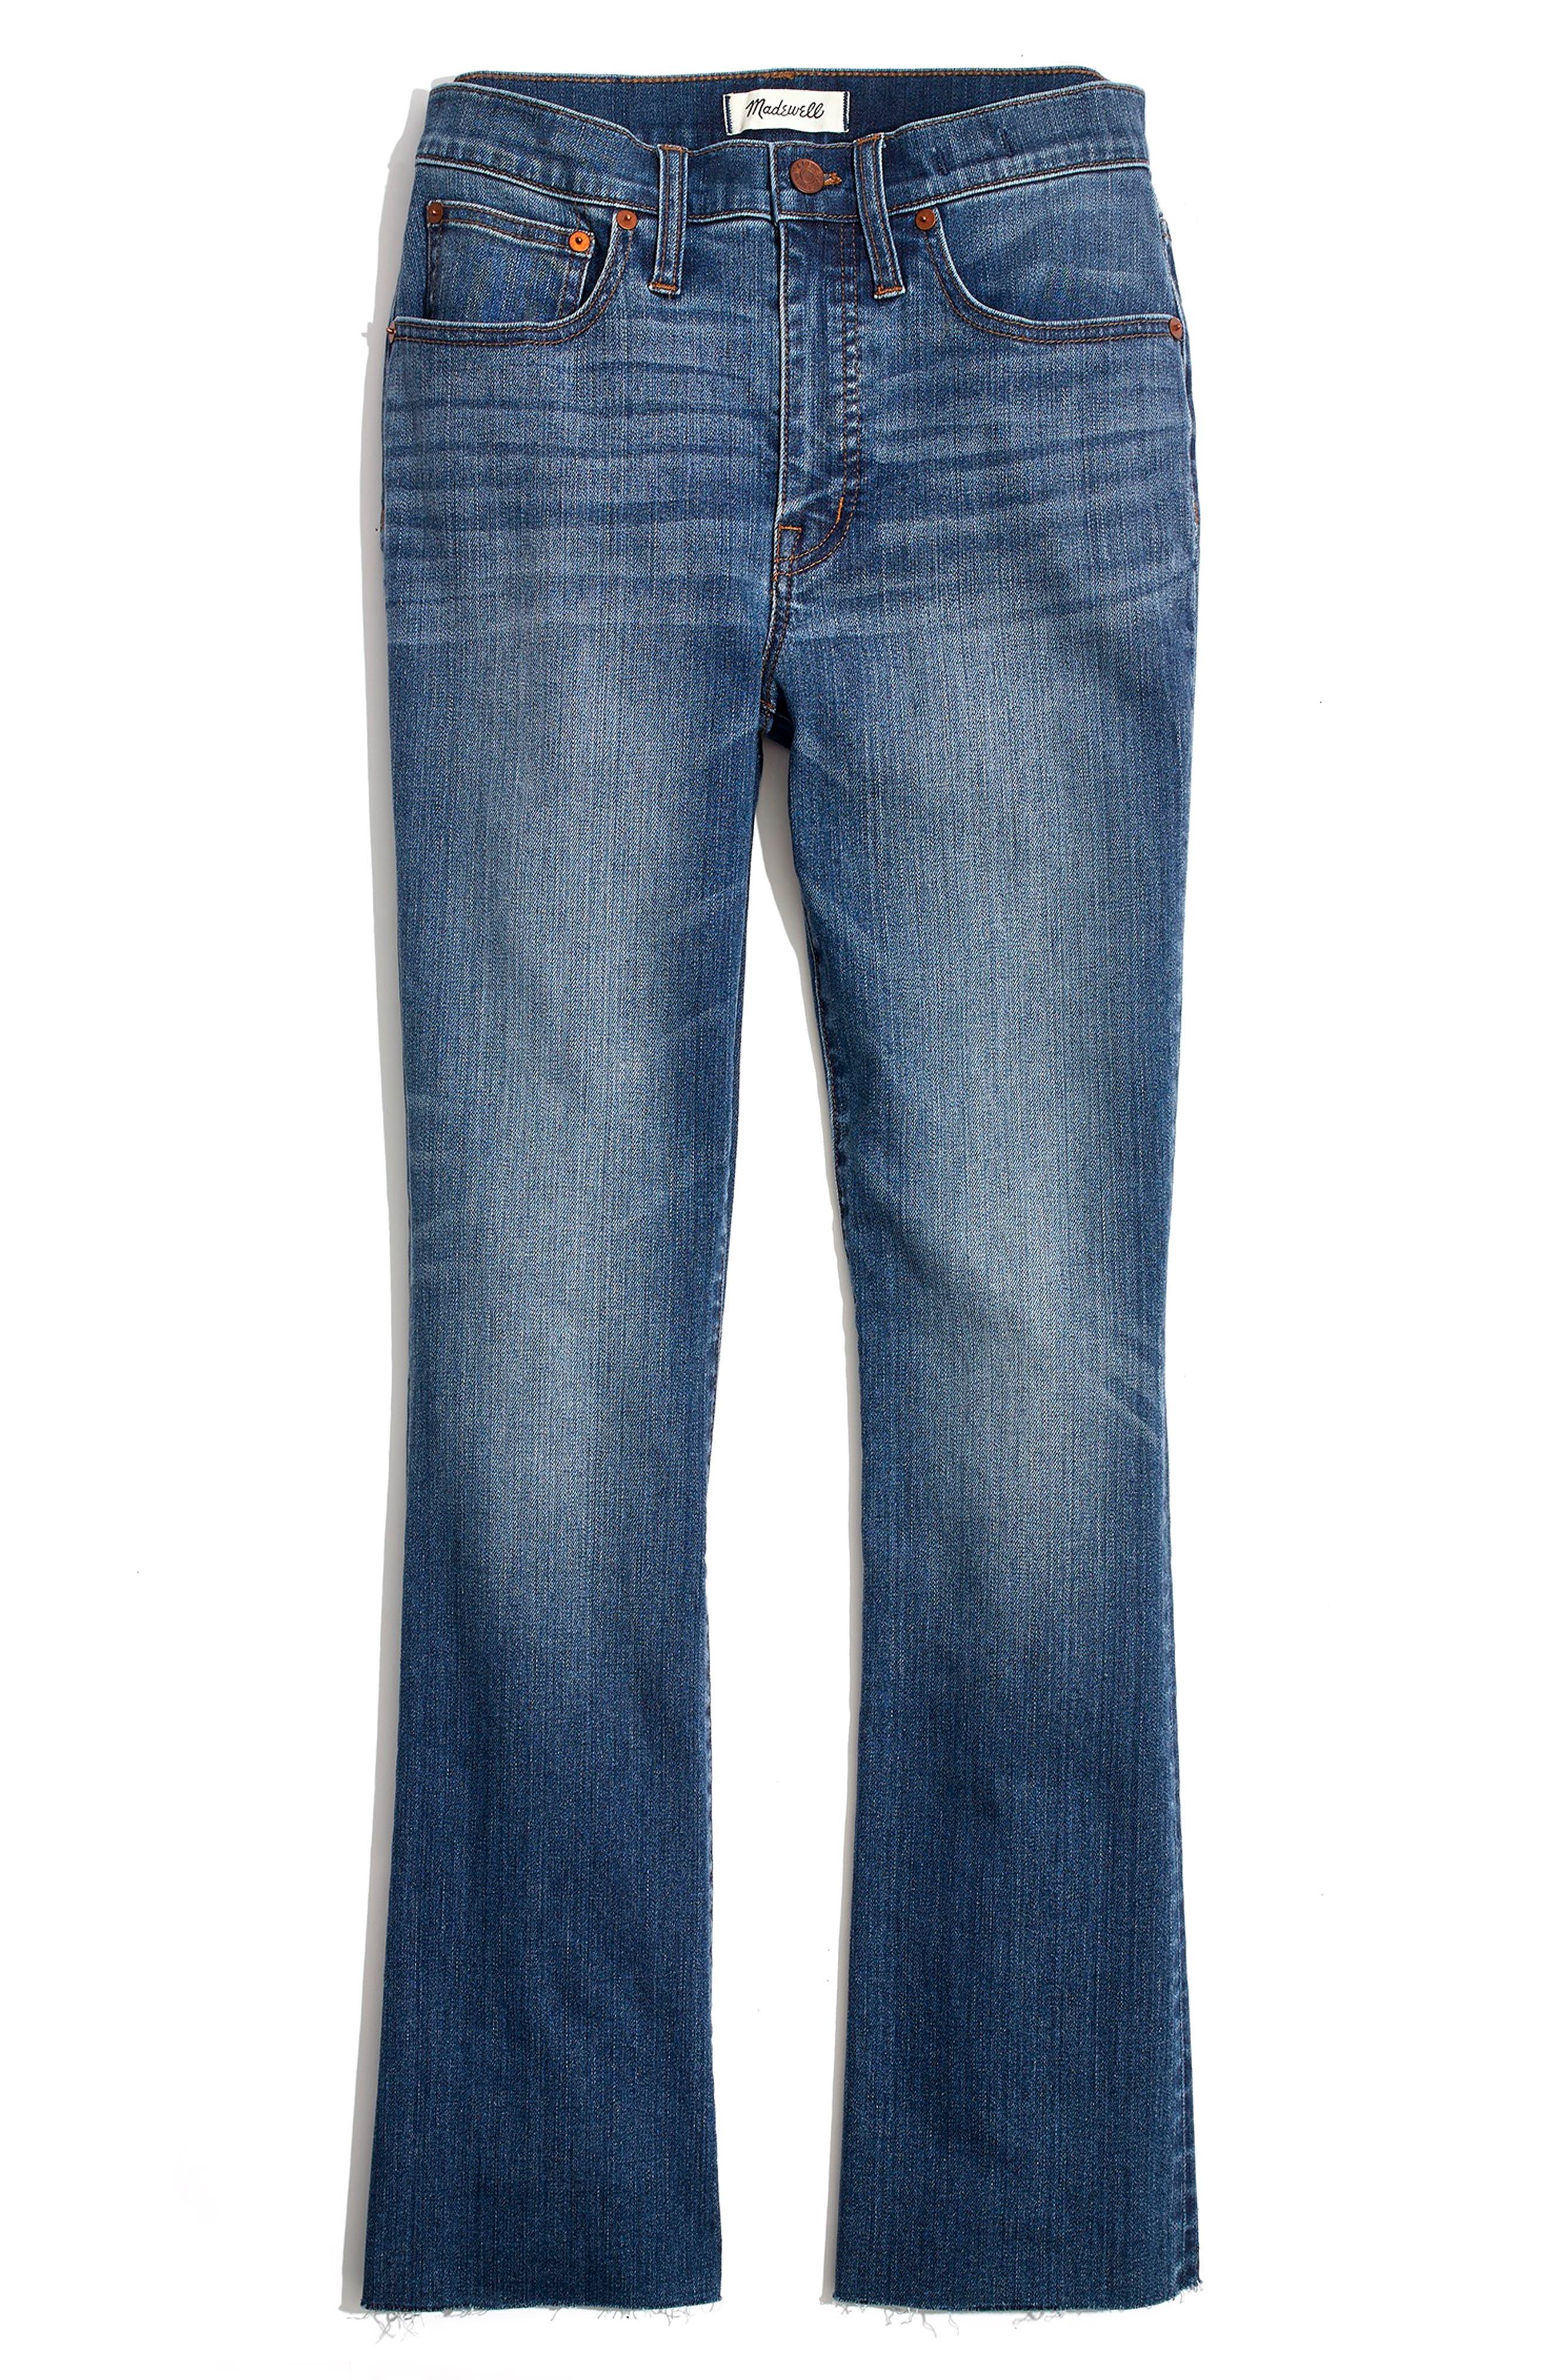 MADEWELL, Cali Back Seam Demi Boot Jeans, Main thumbnail 1, color, 400